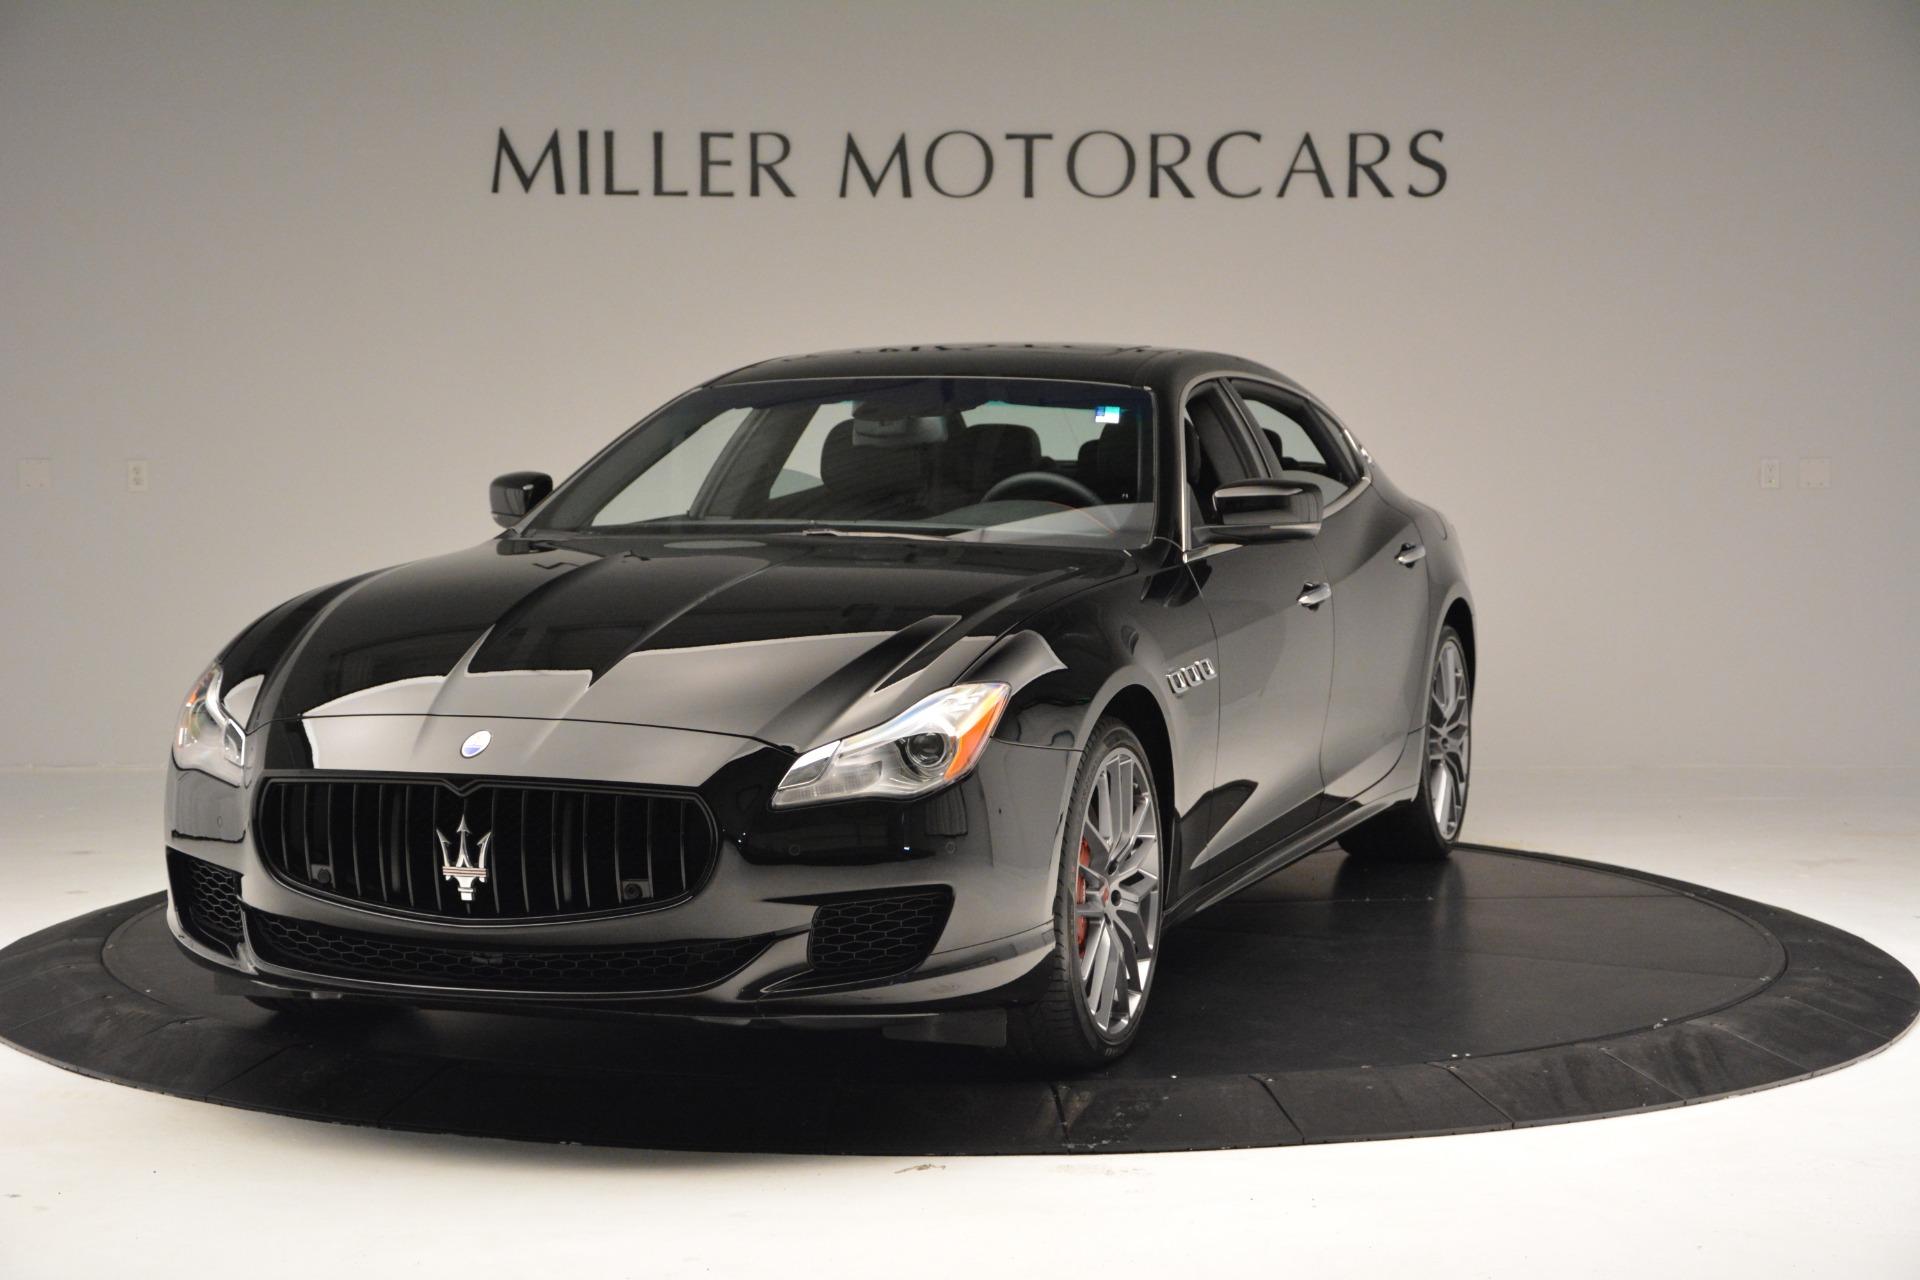 Used 2015 Maserati Quattroporte GTS for sale Sold at Alfa Romeo of Greenwich in Greenwich CT 06830 1